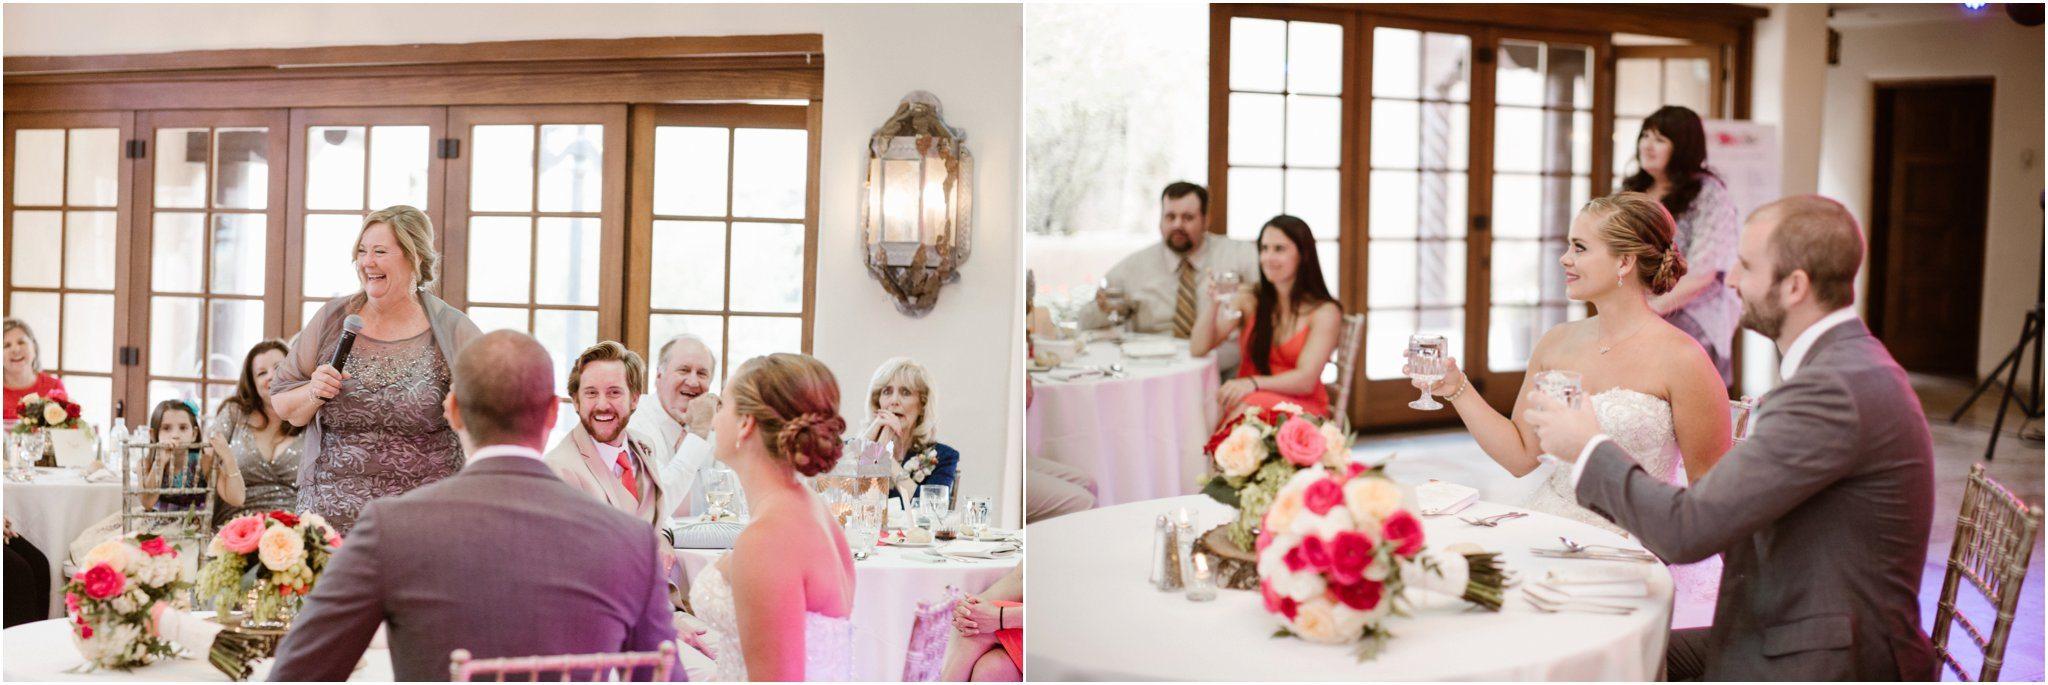 0075albuquerque-wedding-photographer_-santa-fe-wedding-photographer_-southwest-wedding-photography_-blue-rose-studio